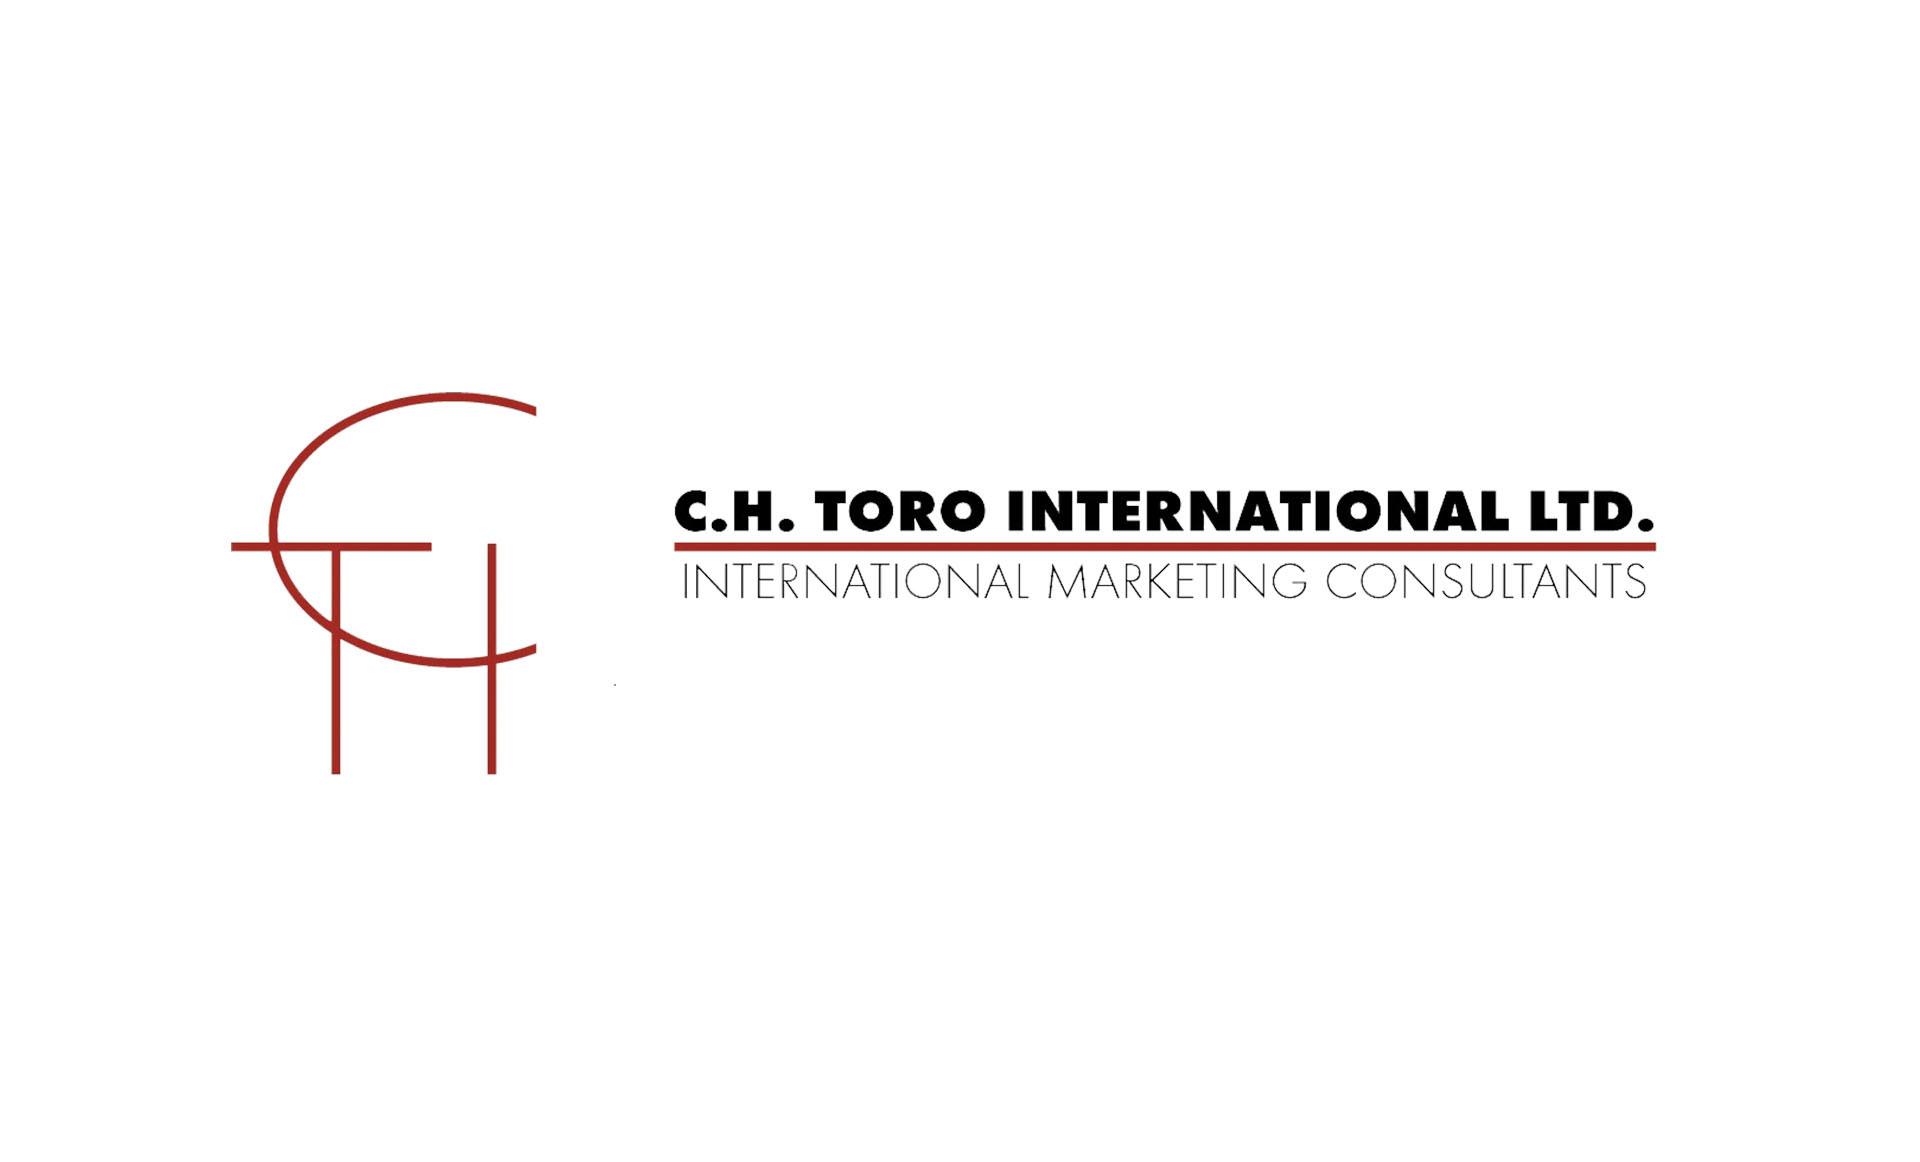 logo-red_0002_CHTI-Logo-trans